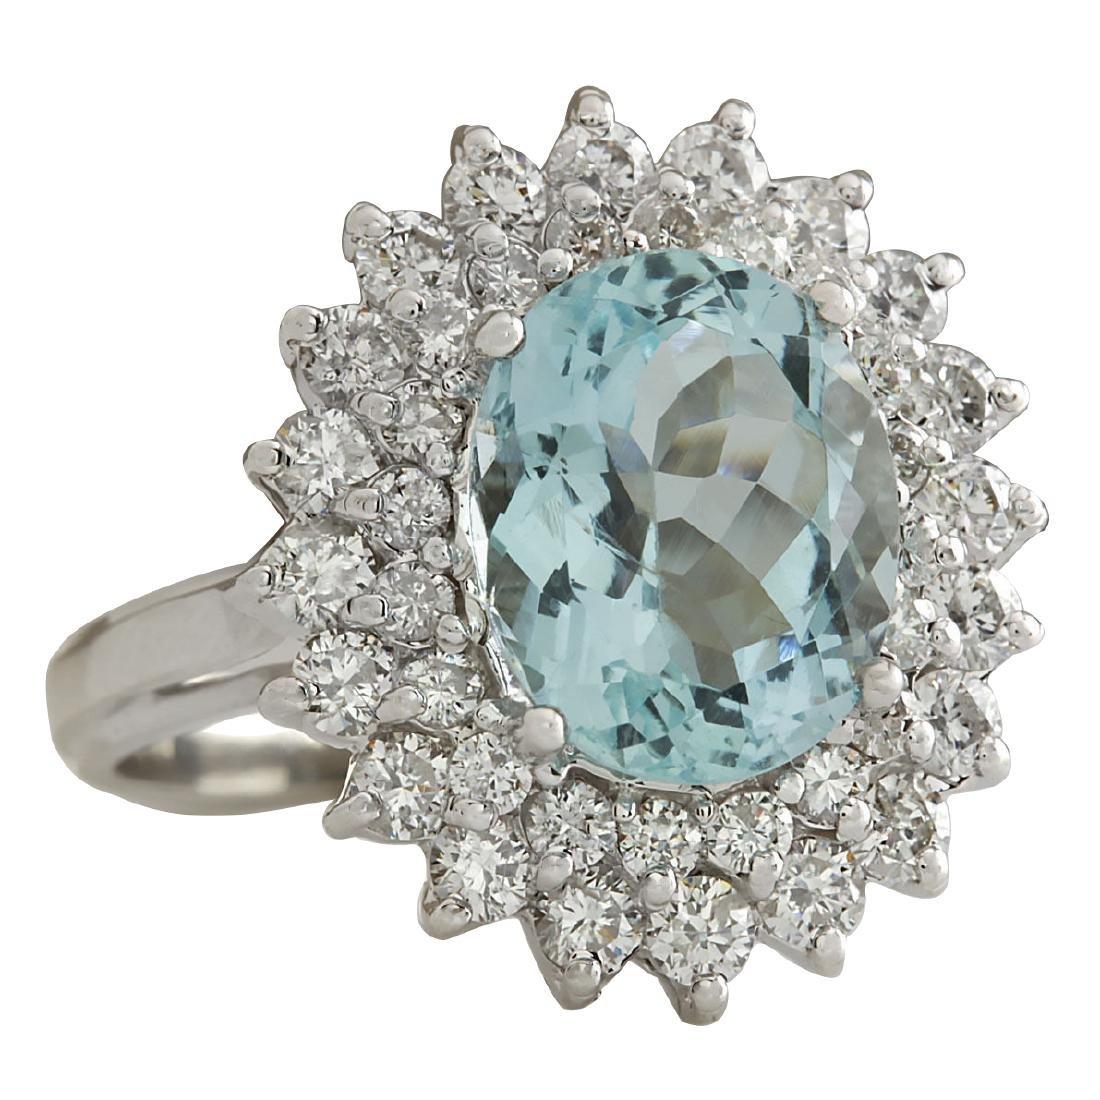 7.03CTW Natural Aquamarine And Diamond Ring In 18K - 2